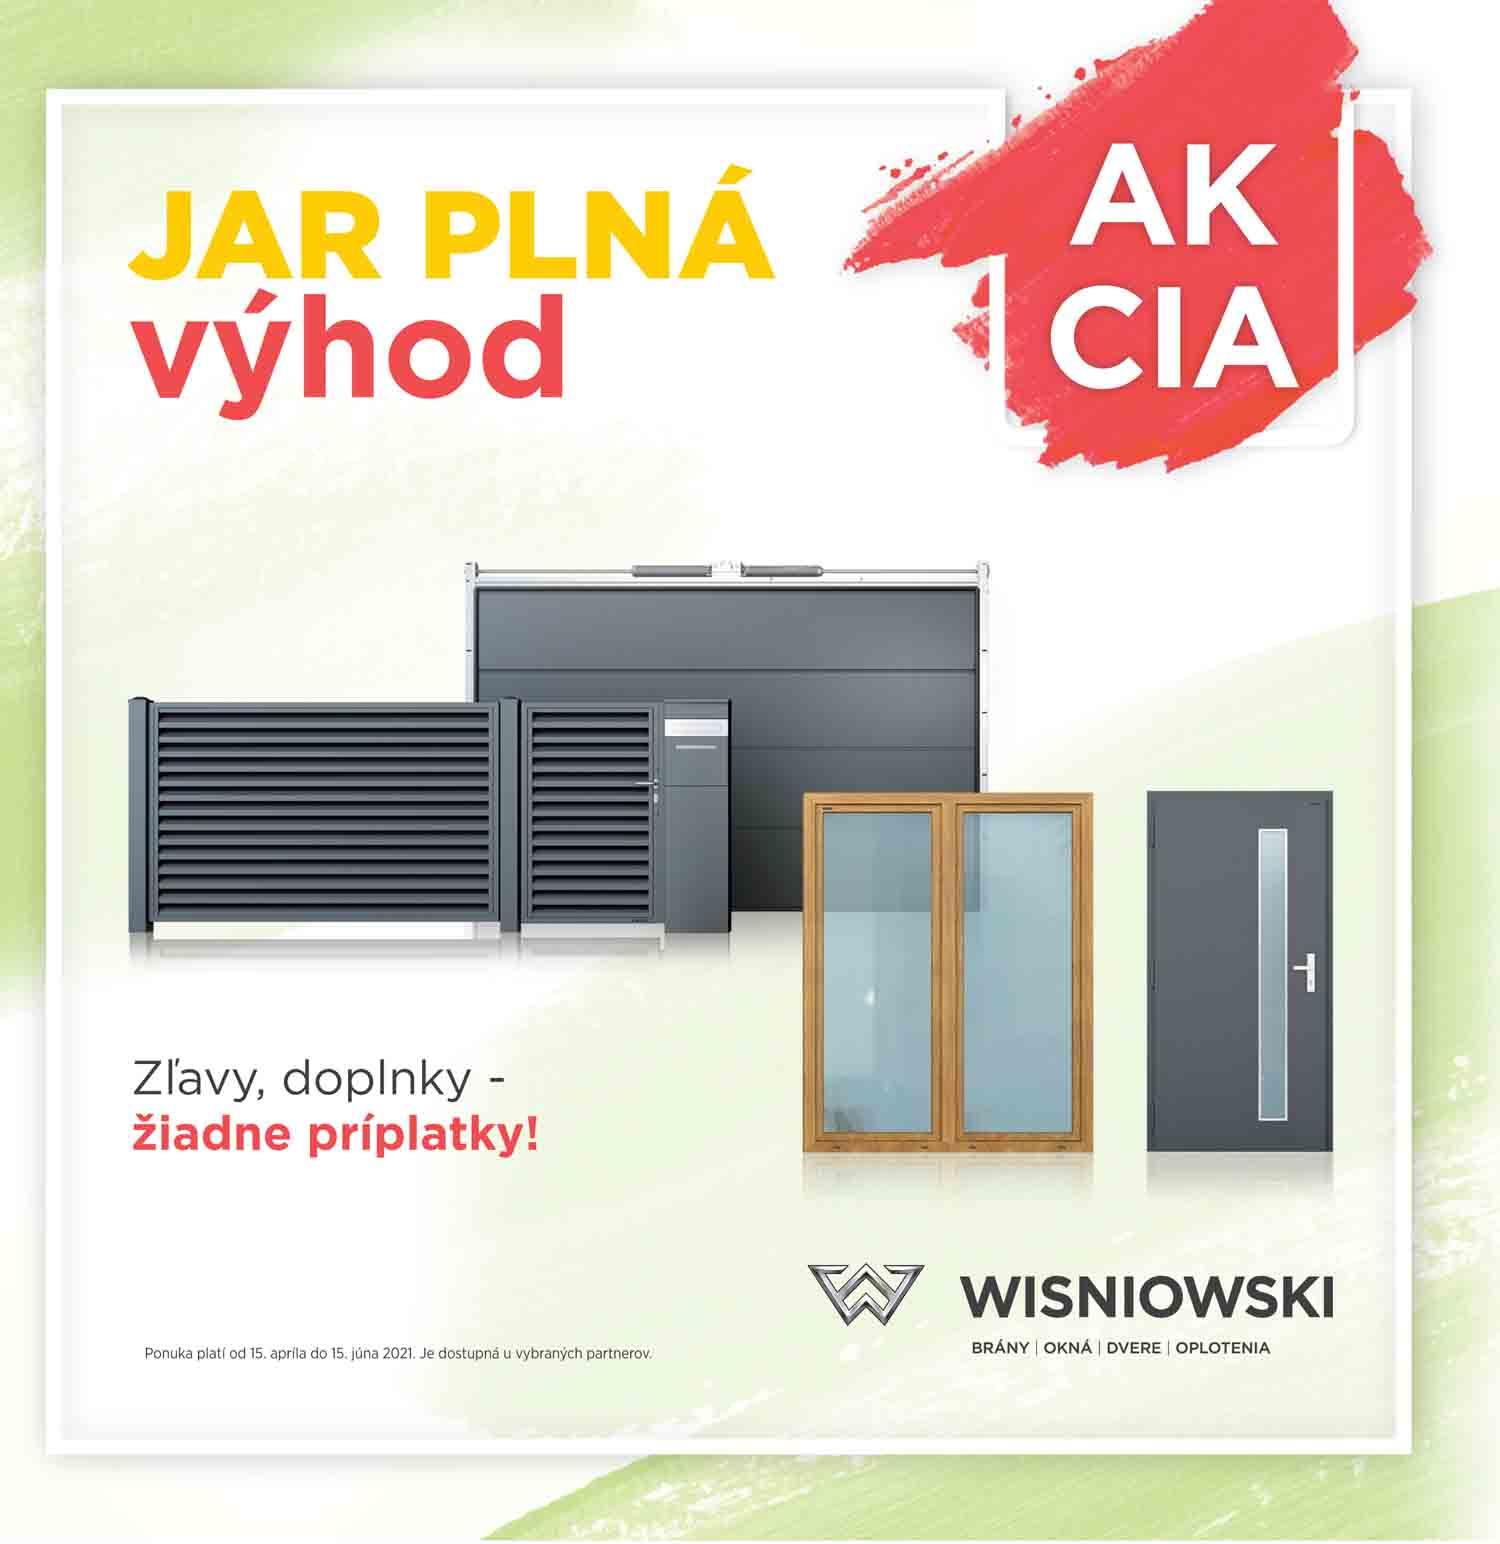 AKCIA-WISNIOWSKI_SK-1